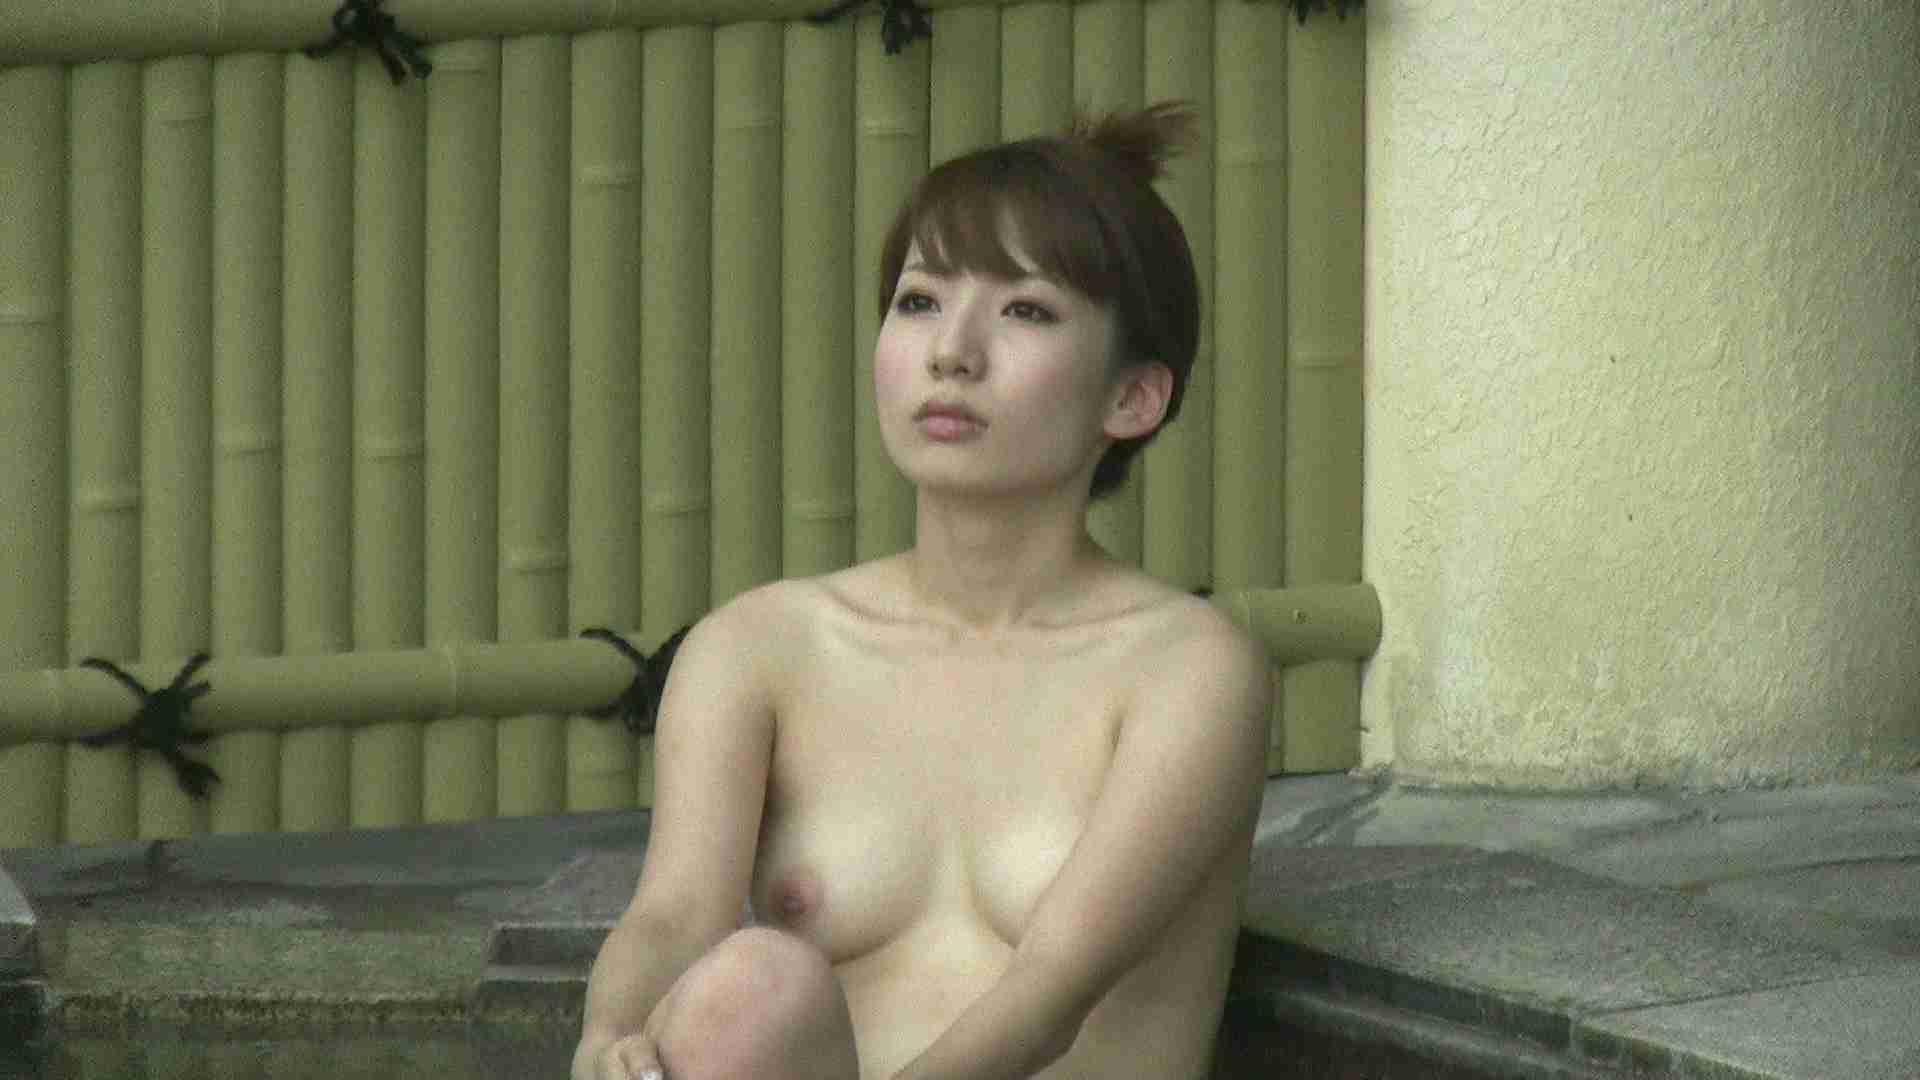 Aquaな露天風呂Vol.208 HなOL   盗撮  101pic 11